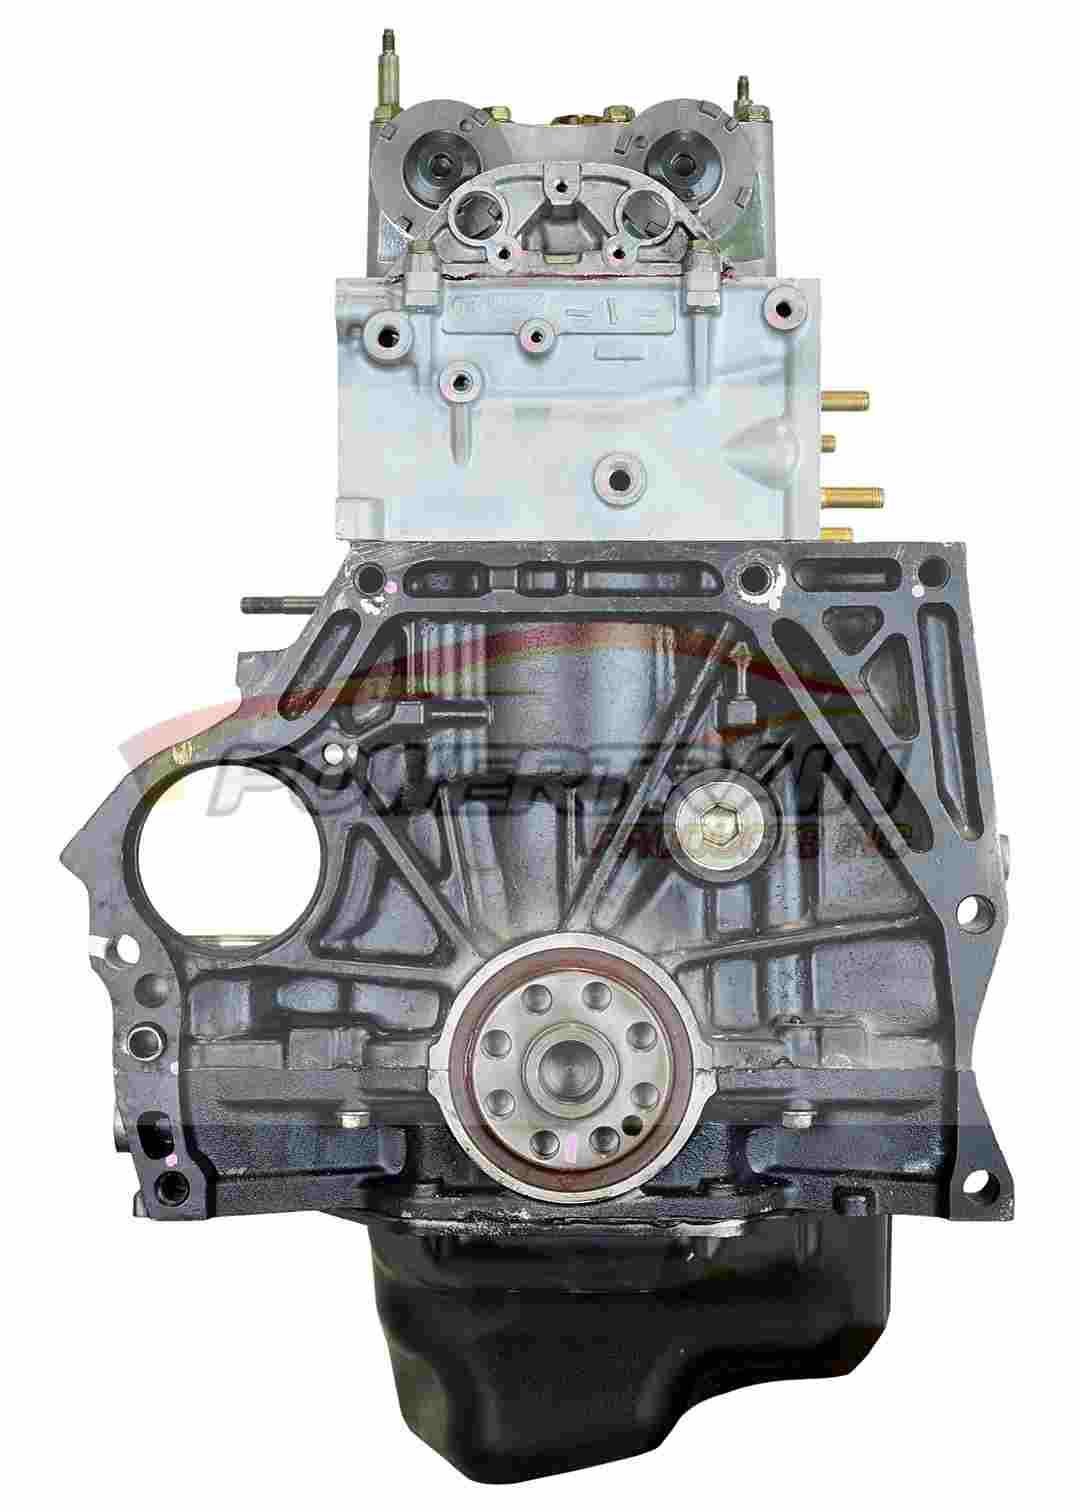 Acura K20a3 engine 02-06 2 0 L4 comp engine